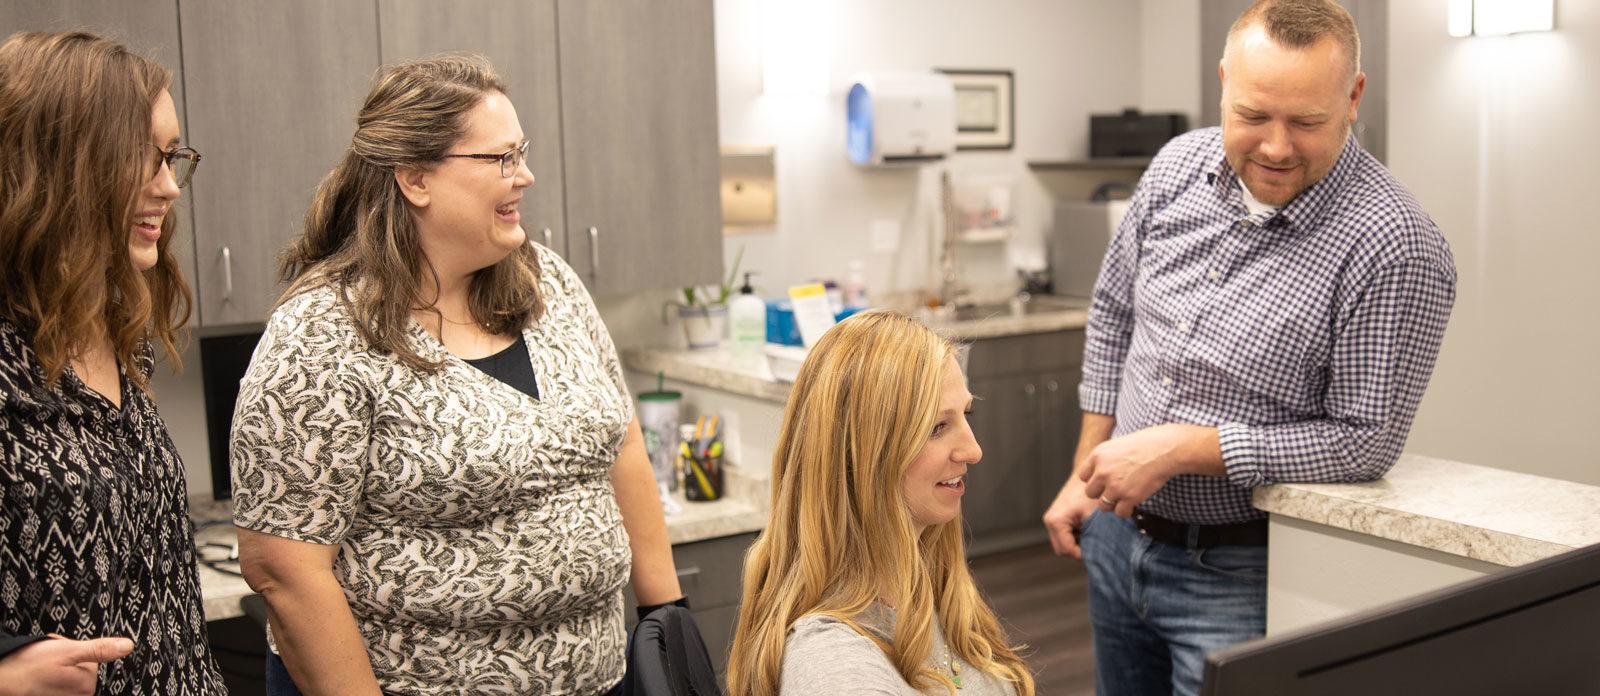 Silver Creek Family Medicine Staff